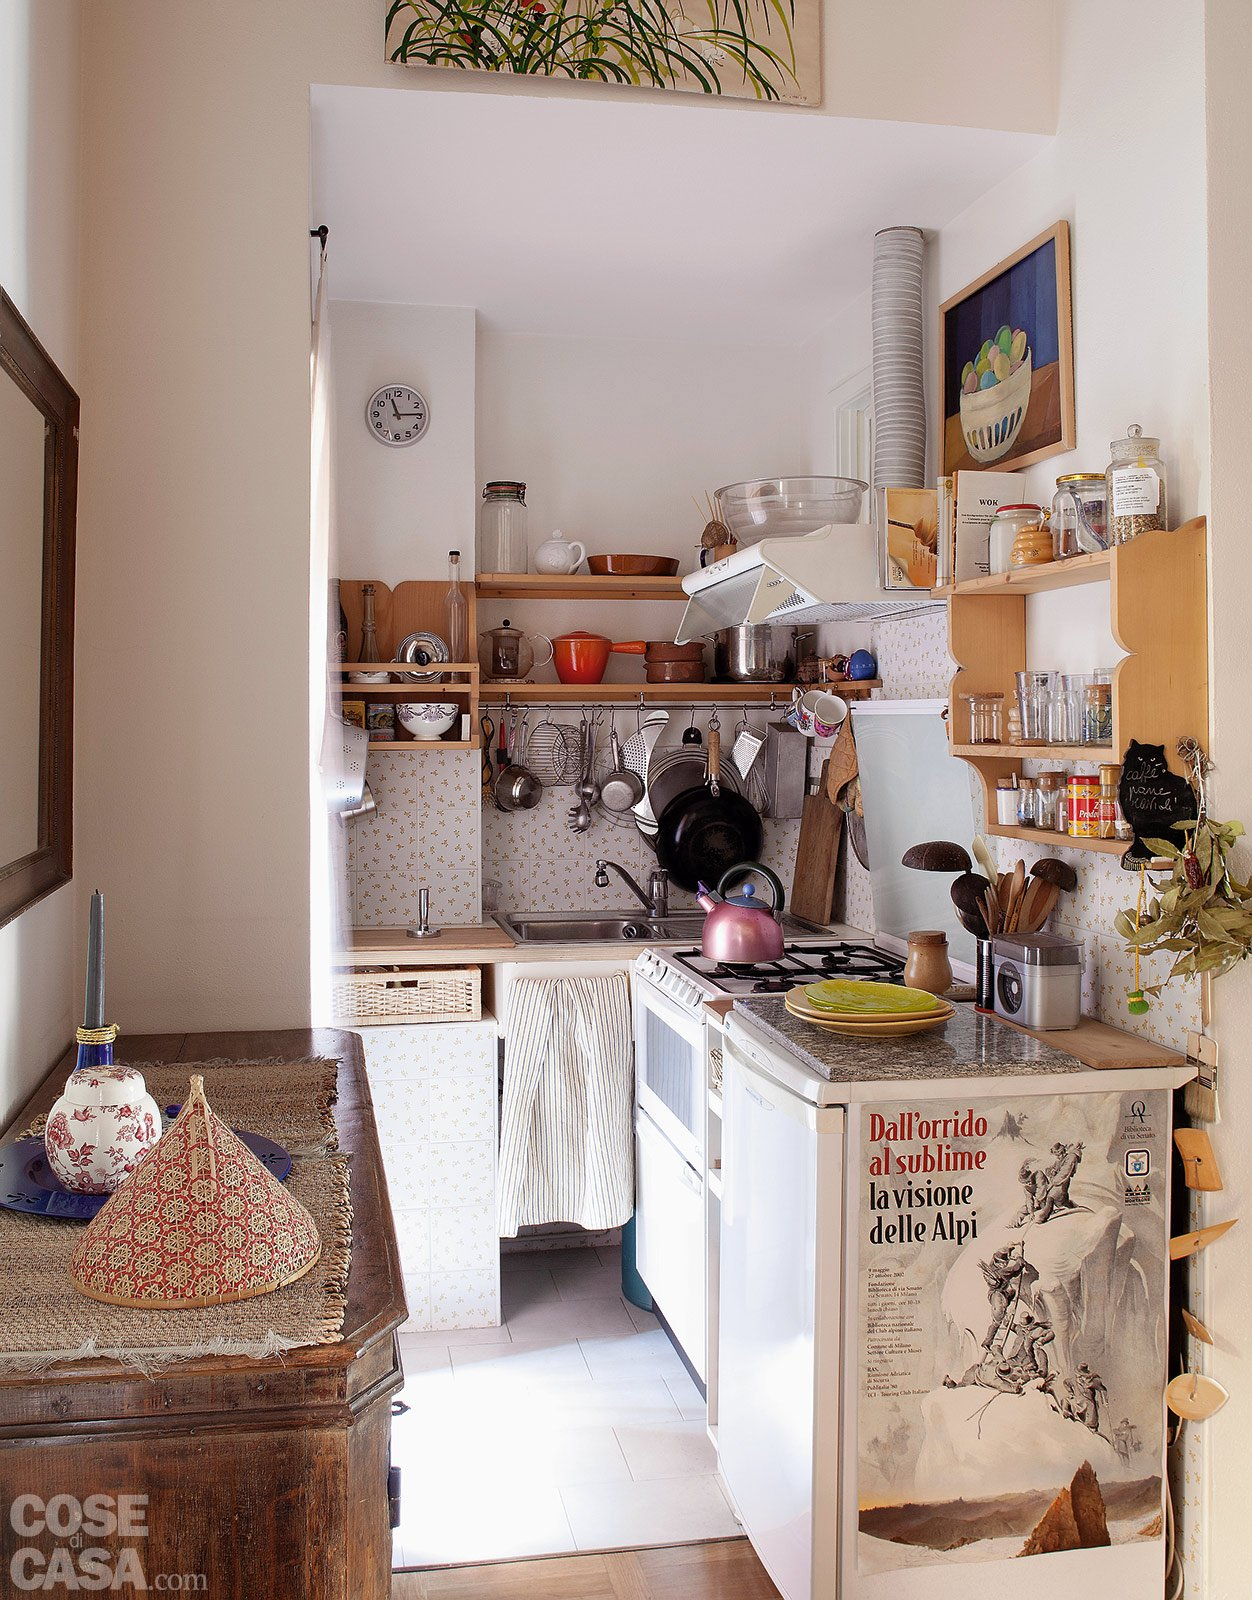 Bilocale di 40 mq una casa fai da te cose di casa - Costruire una cucina con materiali di recupero ...